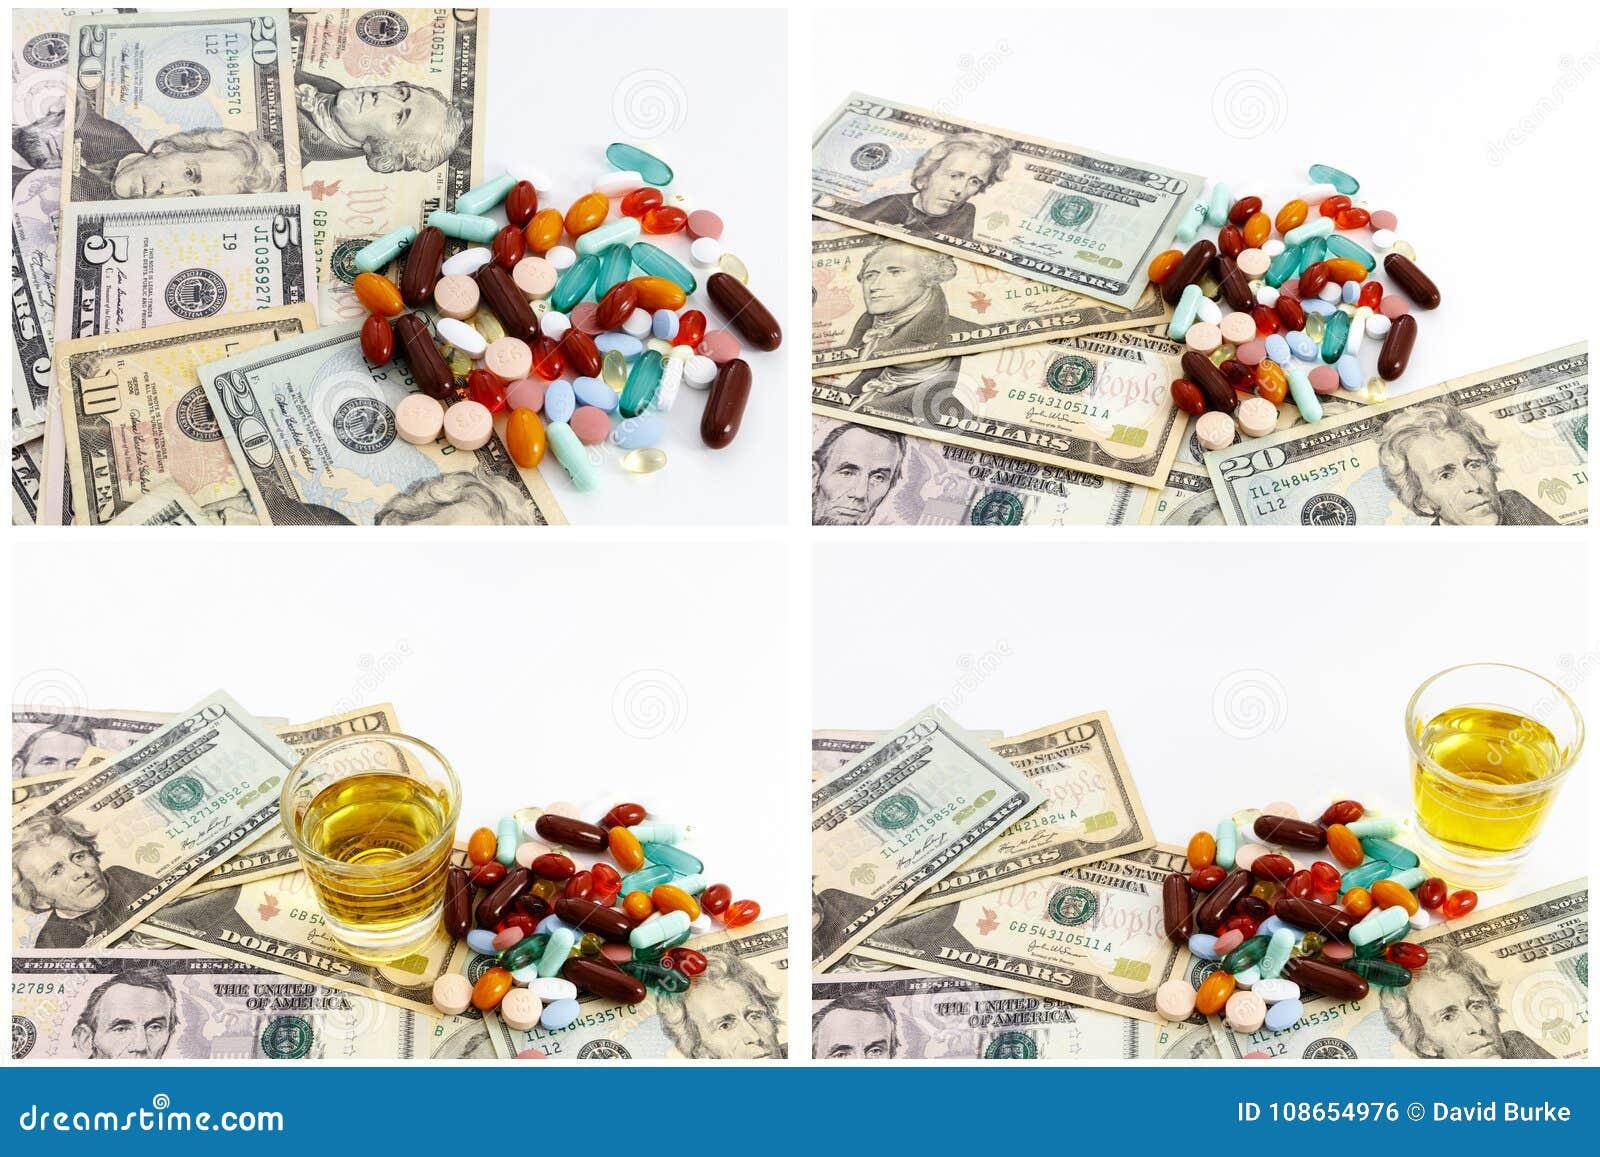 Narcotics pills drugs medicine cash collage